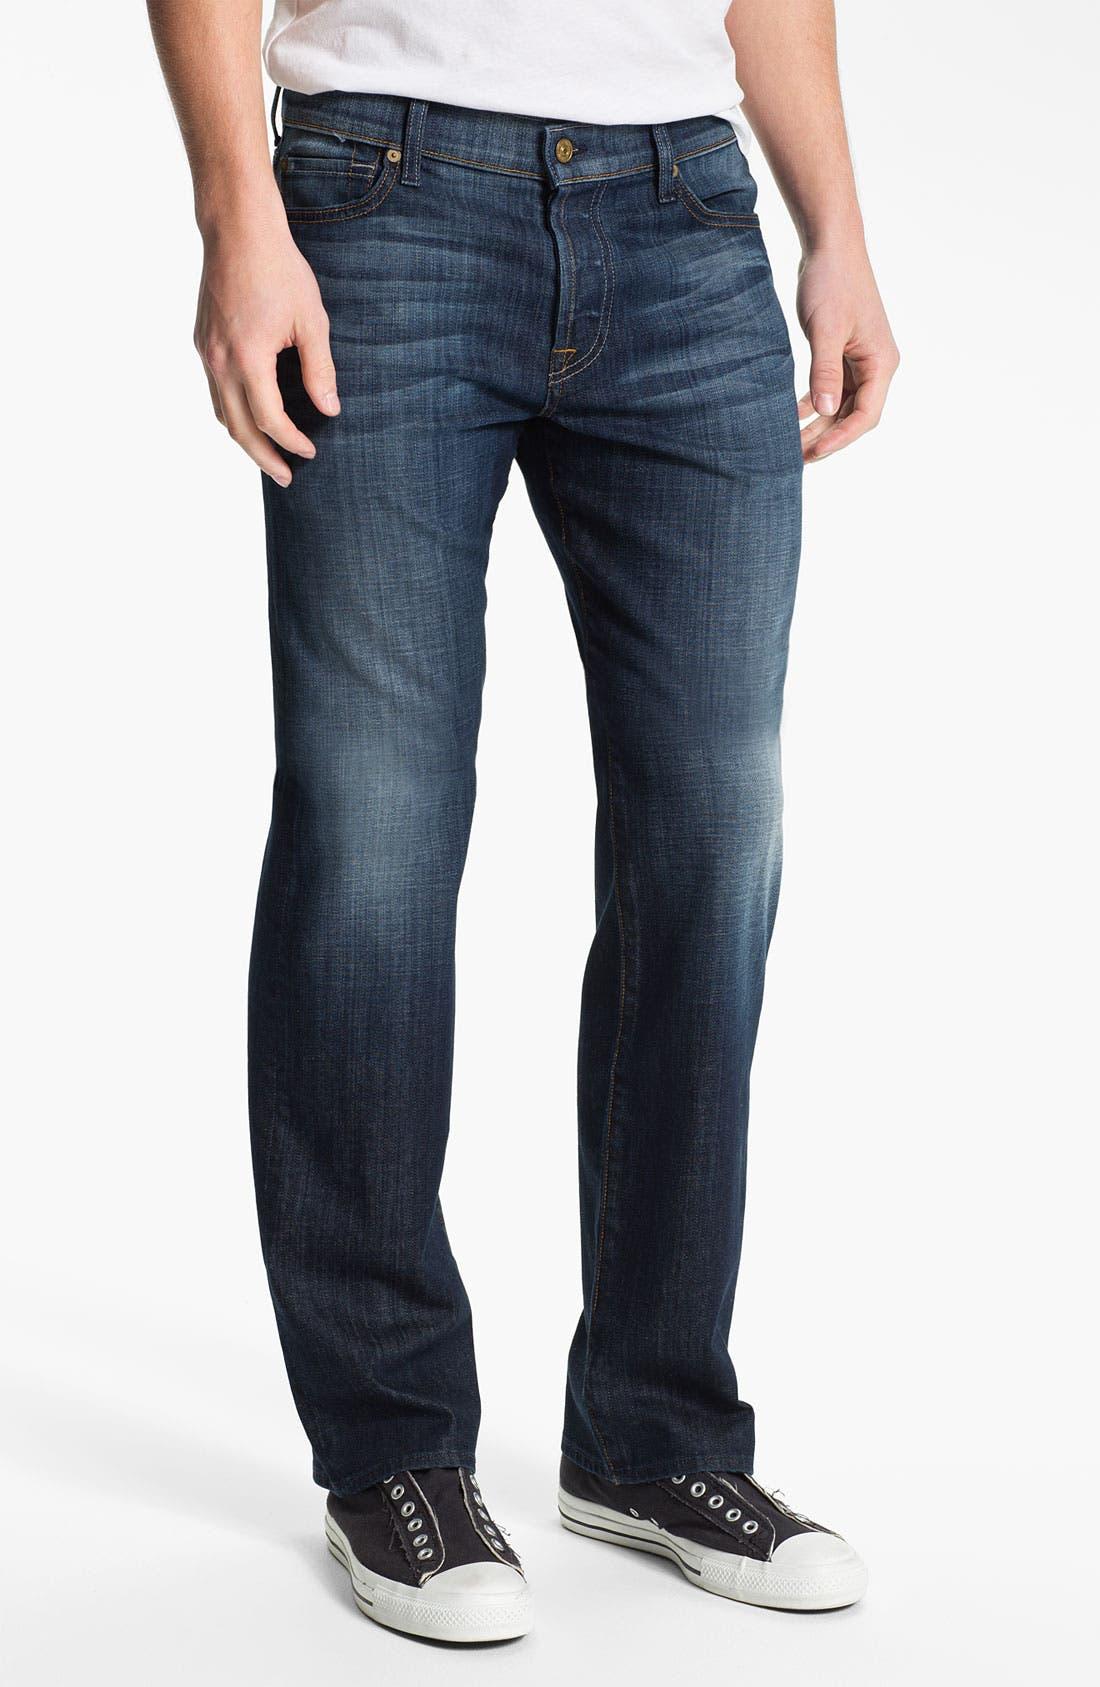 Alternate Image 2  - 7 For All Mankind® 'Standard' Straight Leg Jeans (Worn L.A. Dark)